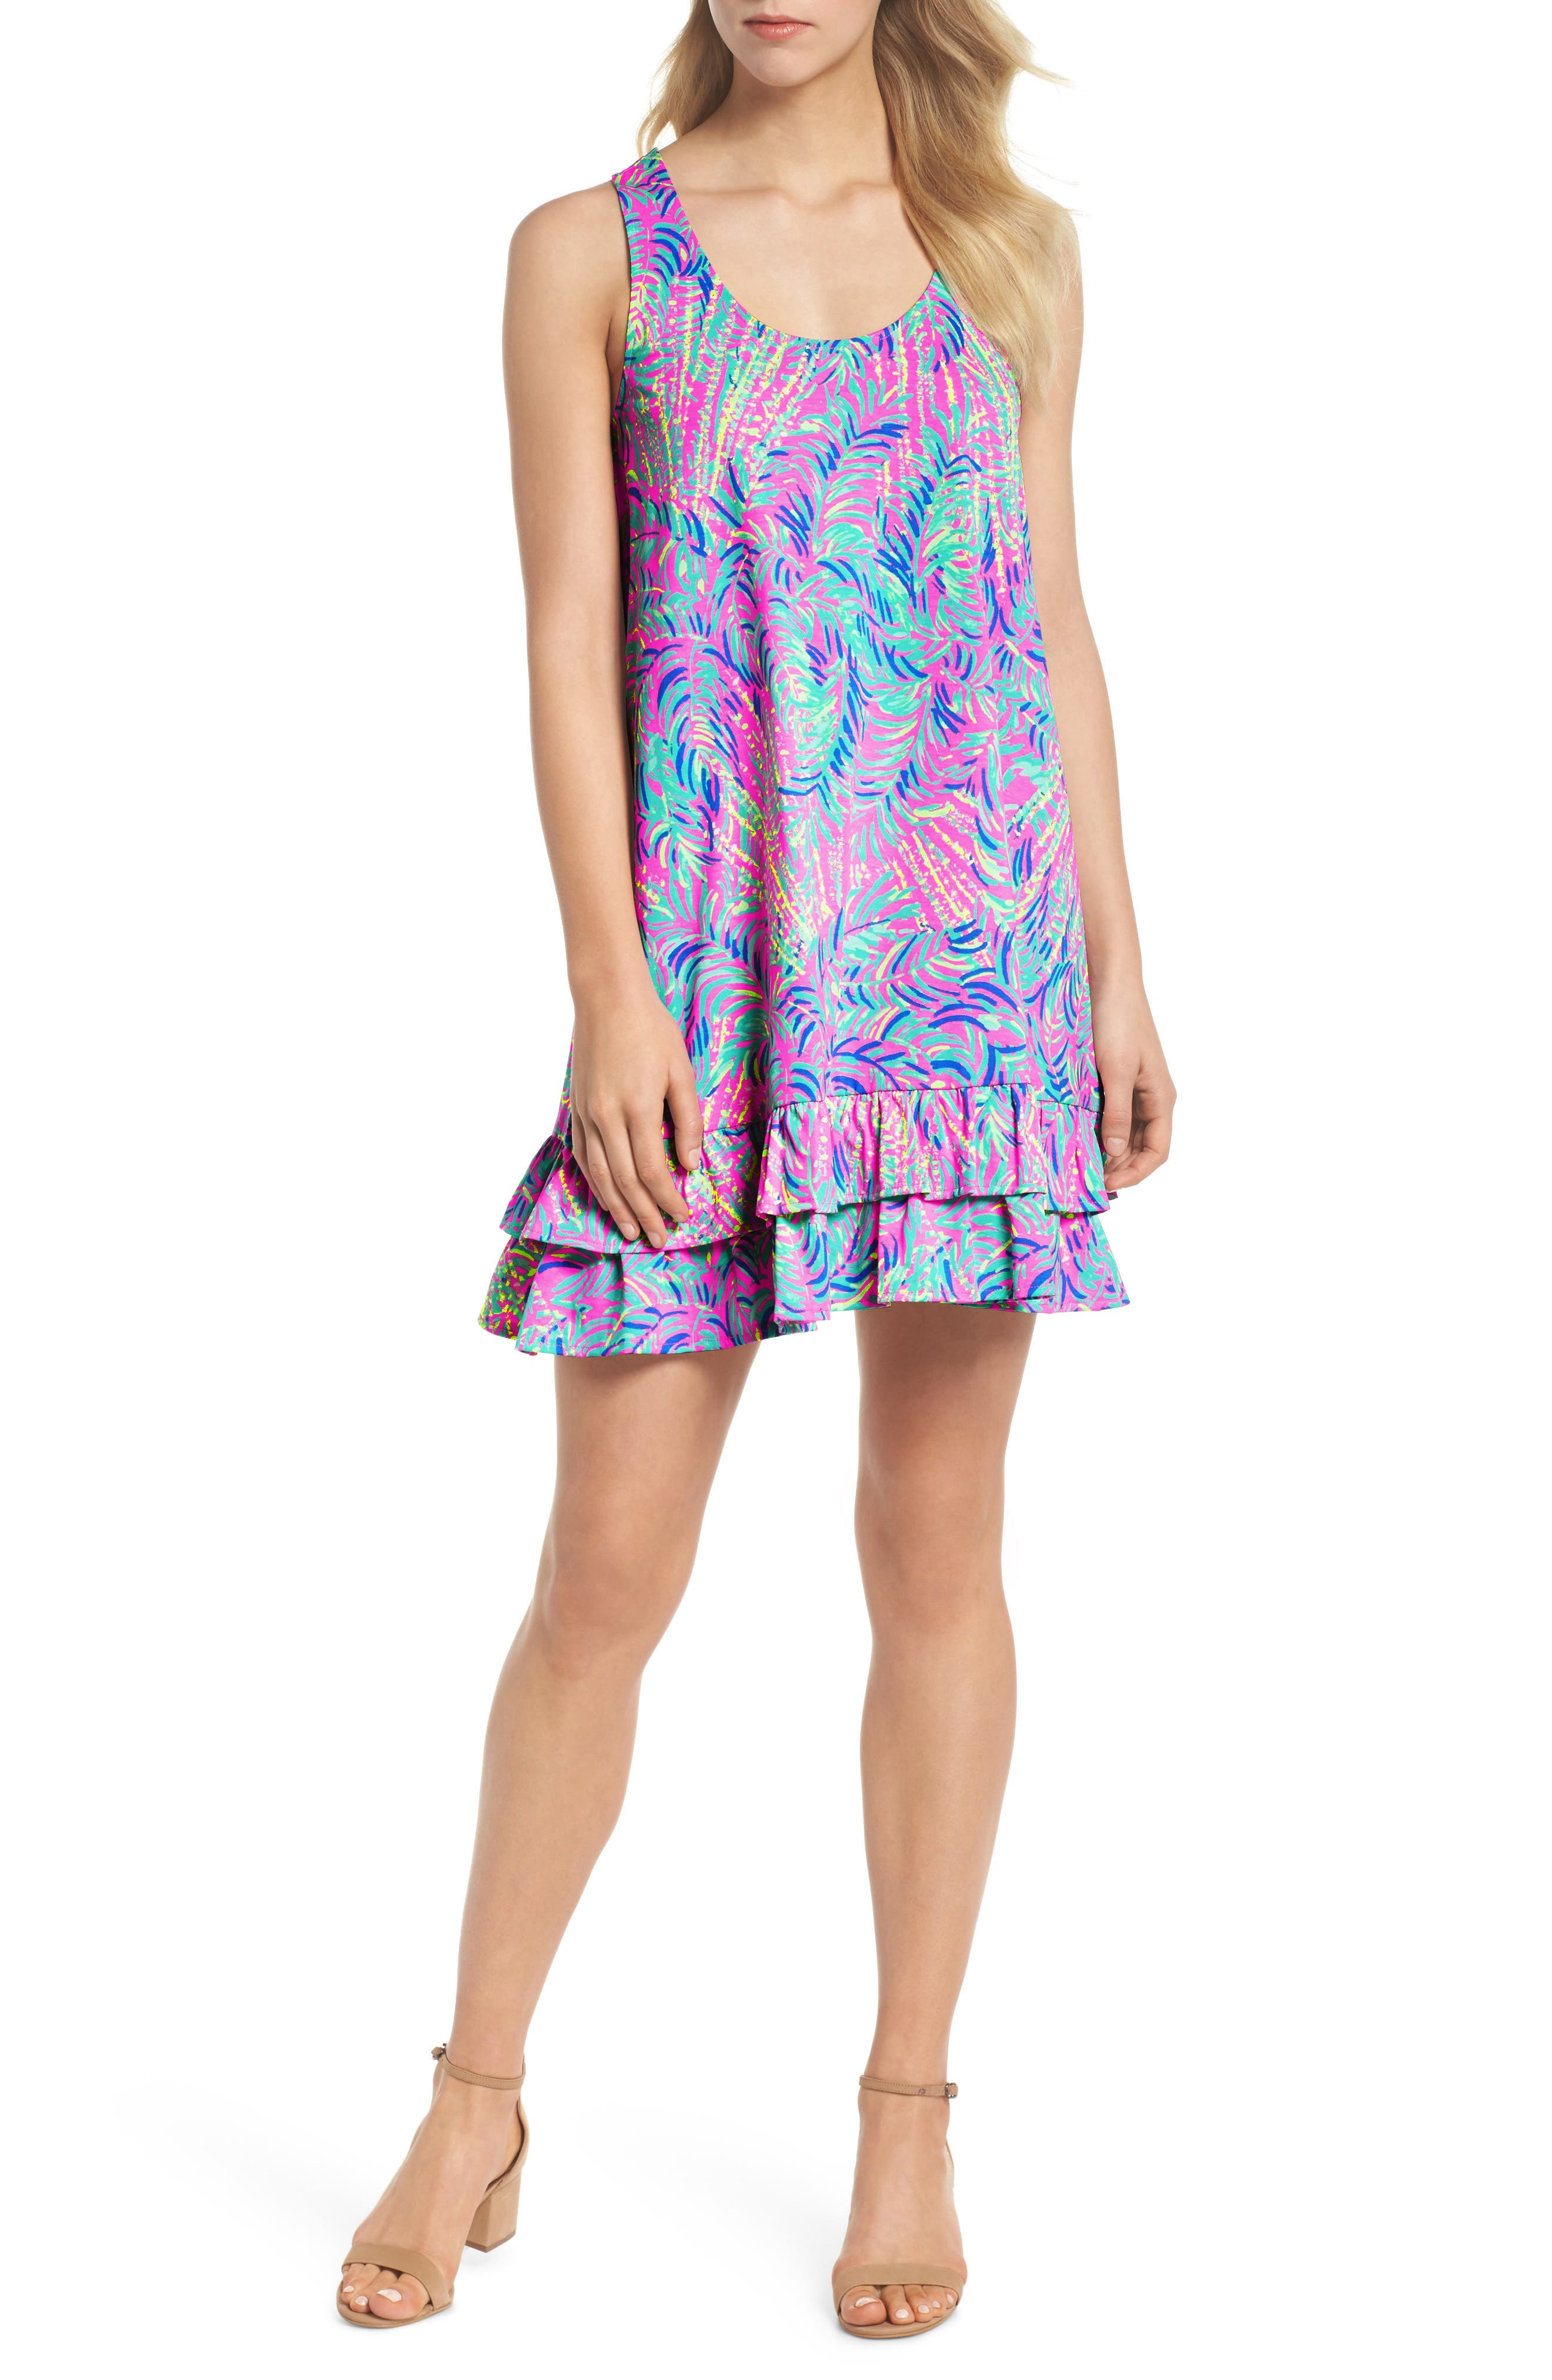 Main Image - Lilly Pulitzer® Evangelia Sleeveless Racerback Dress